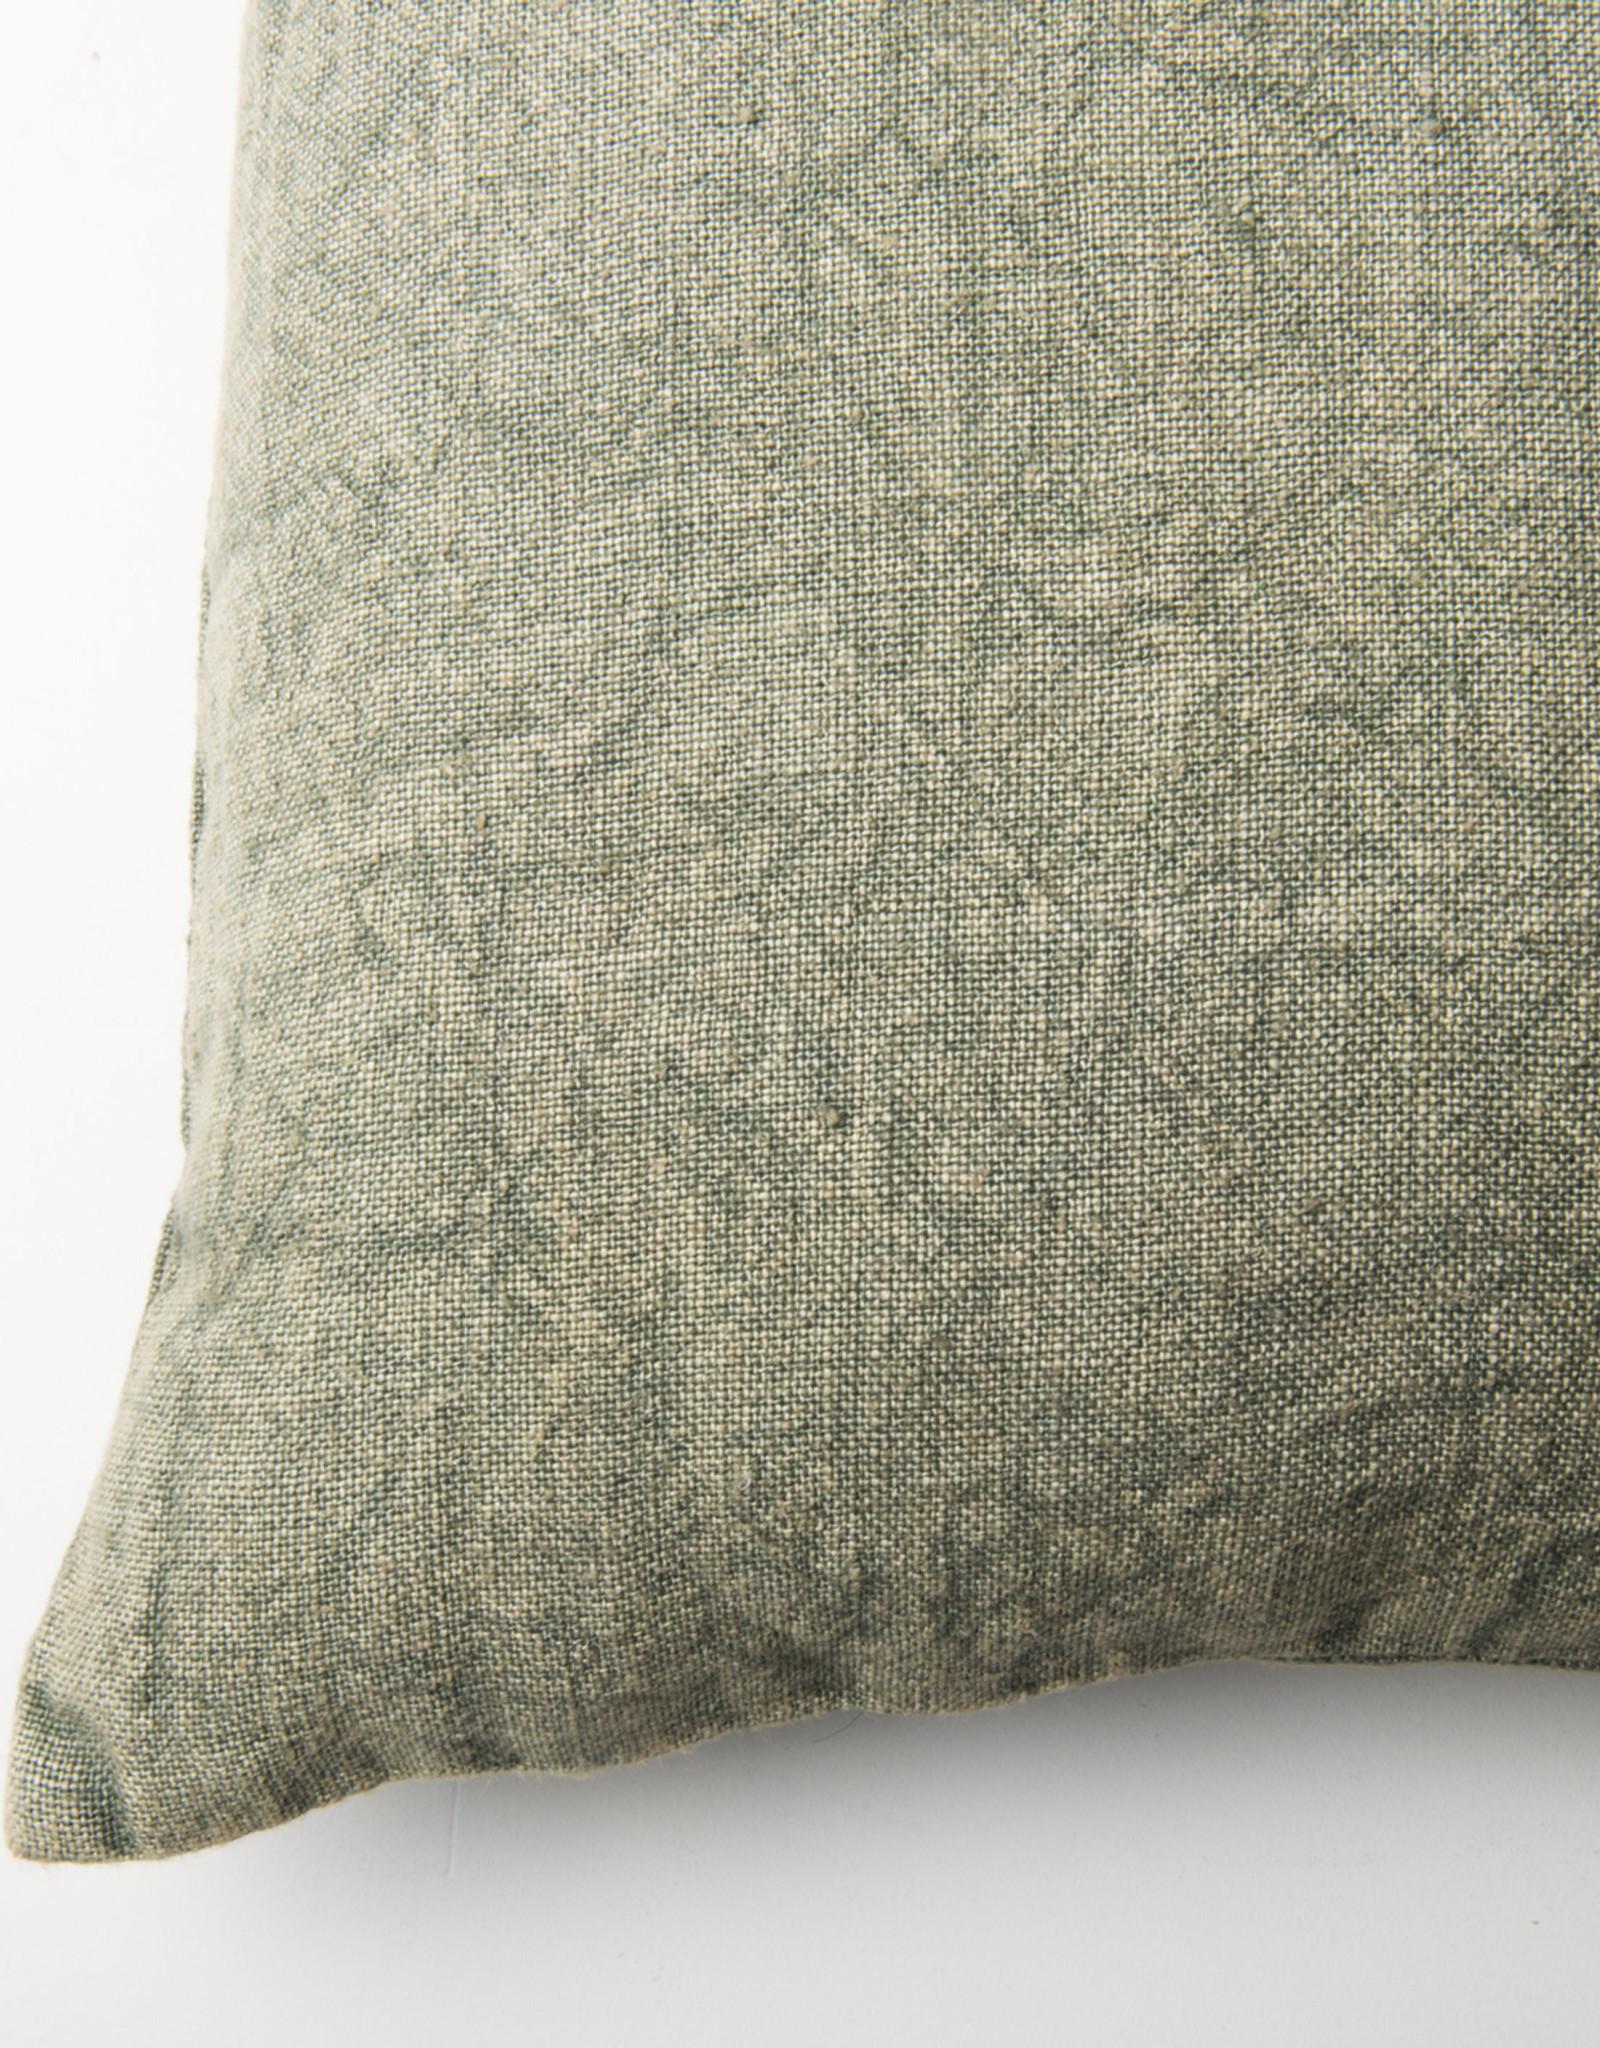 Urban Nature Culture Cushion Comporta jadesheen